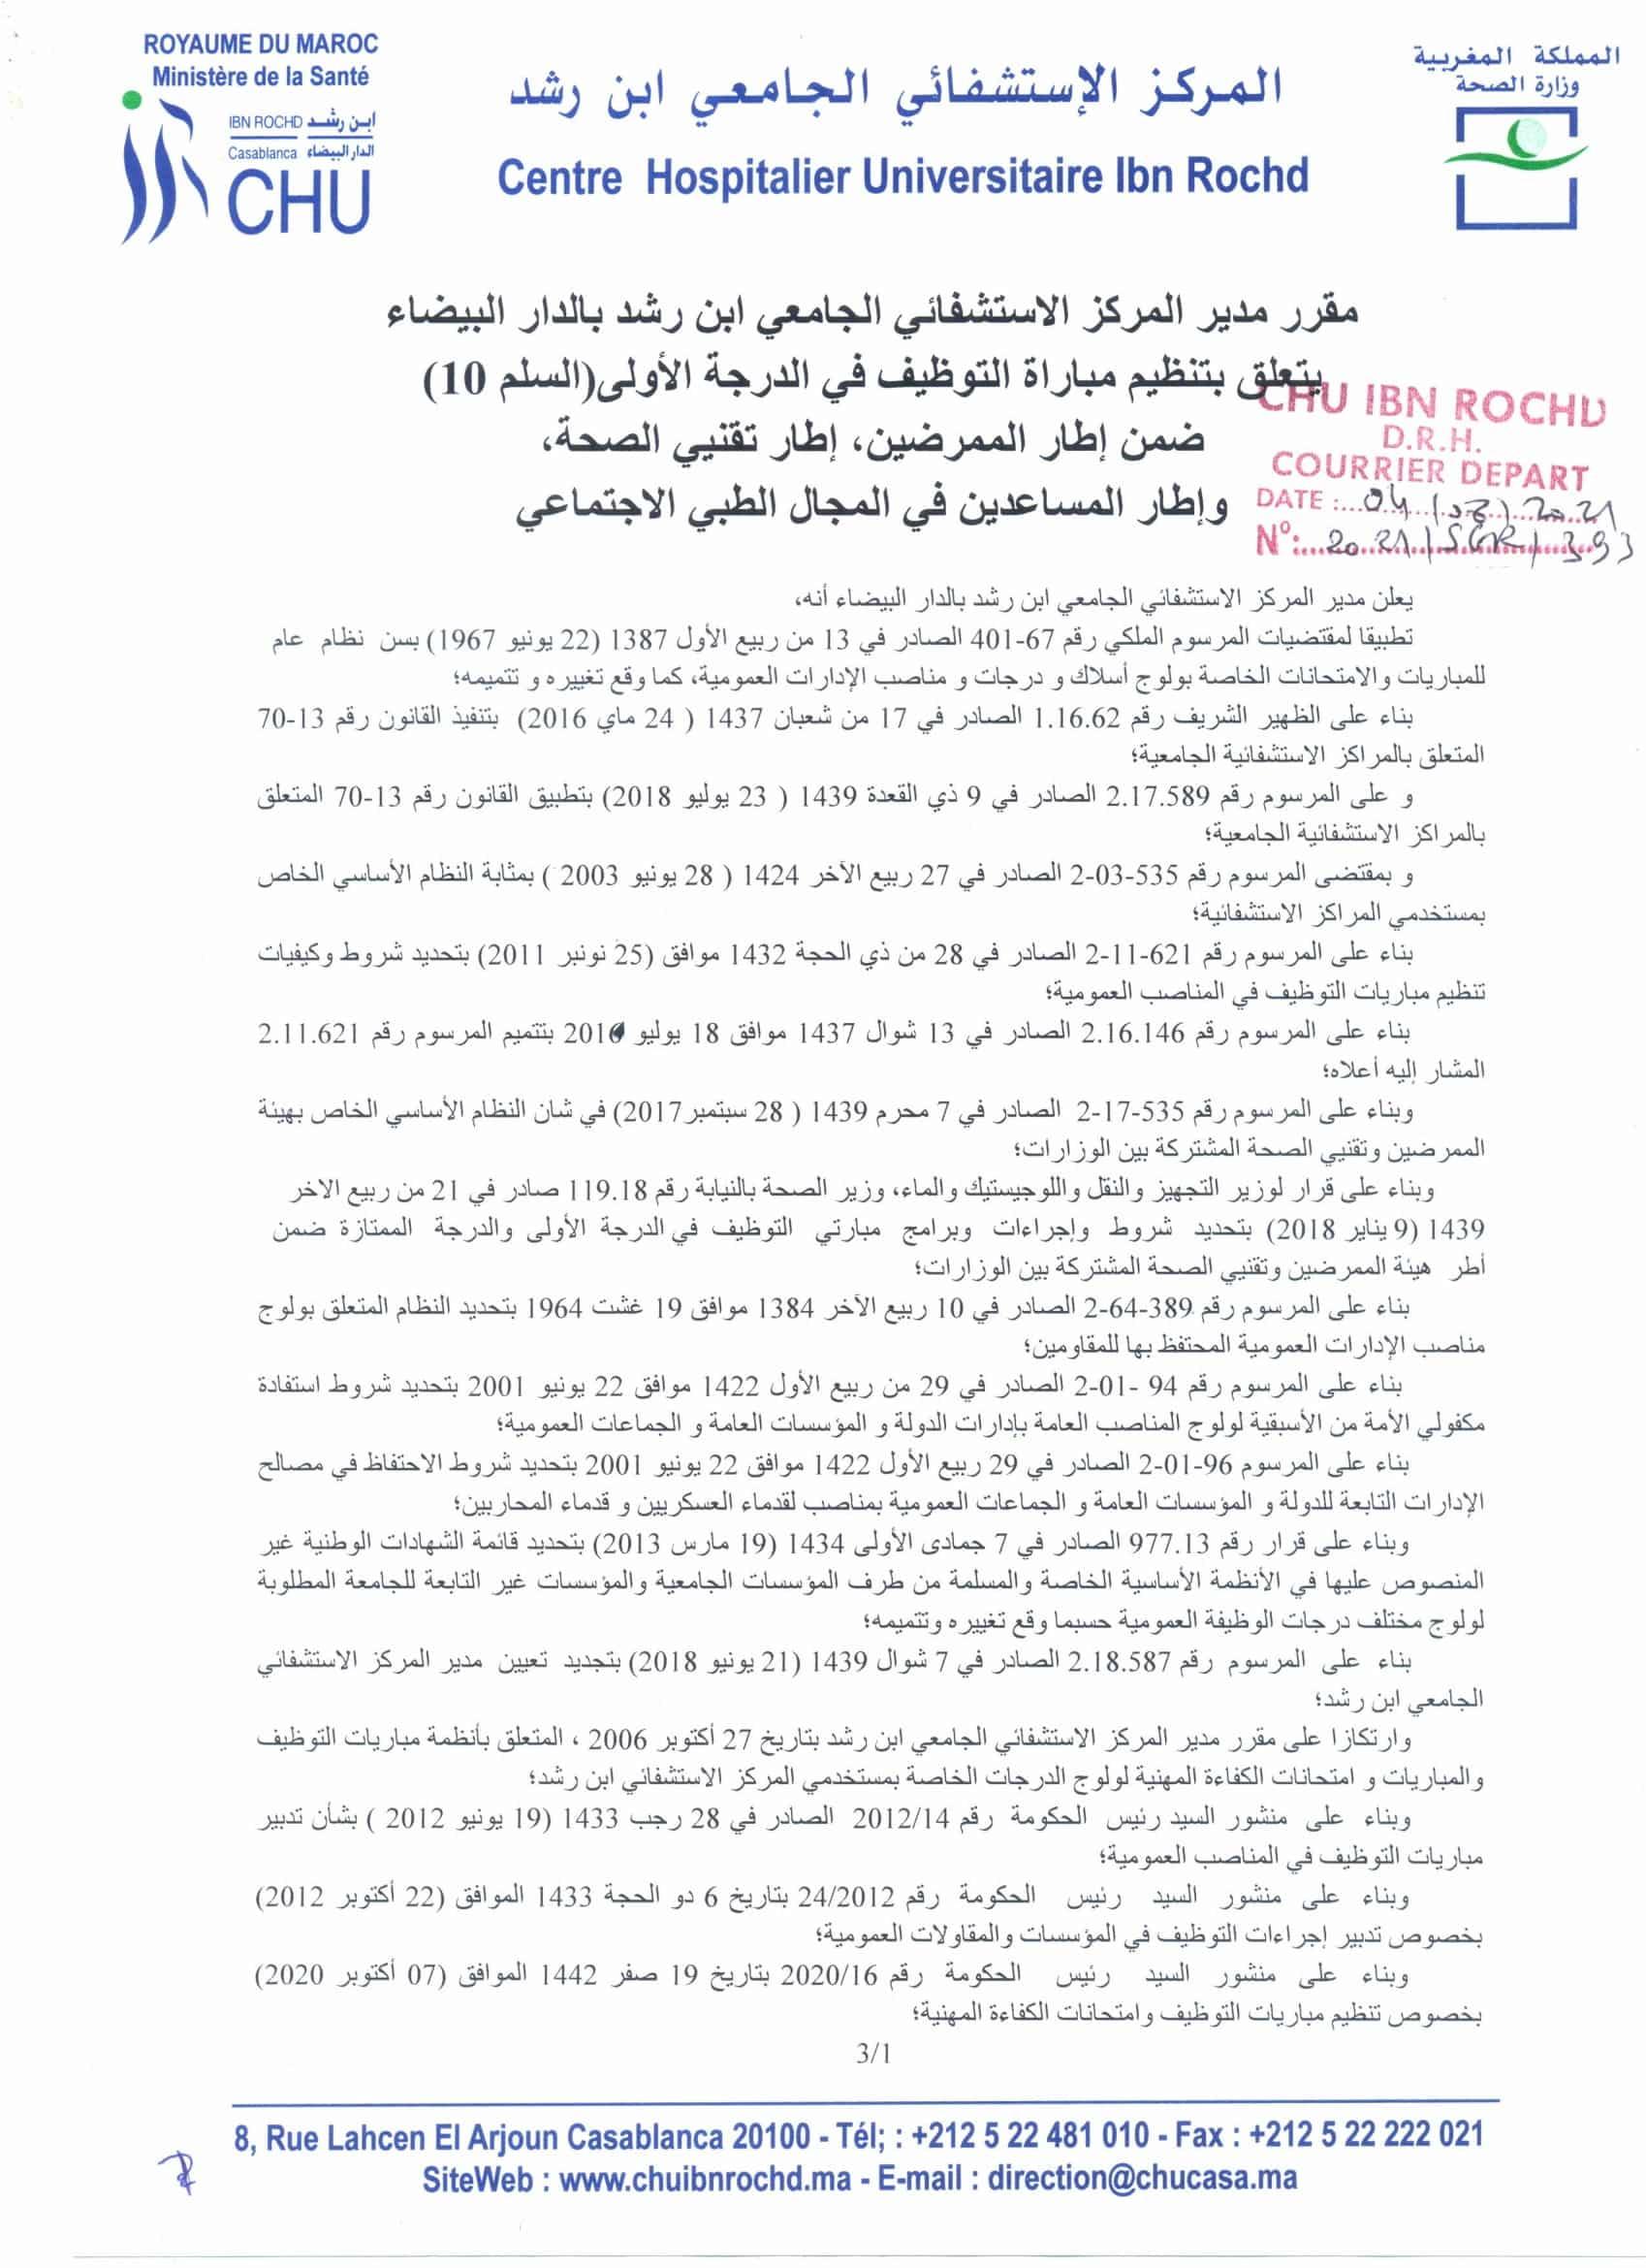 RECRUTINF3102021 1 Concours de Recrutement CHU Ibn Rochd 2021 (156 Postes)